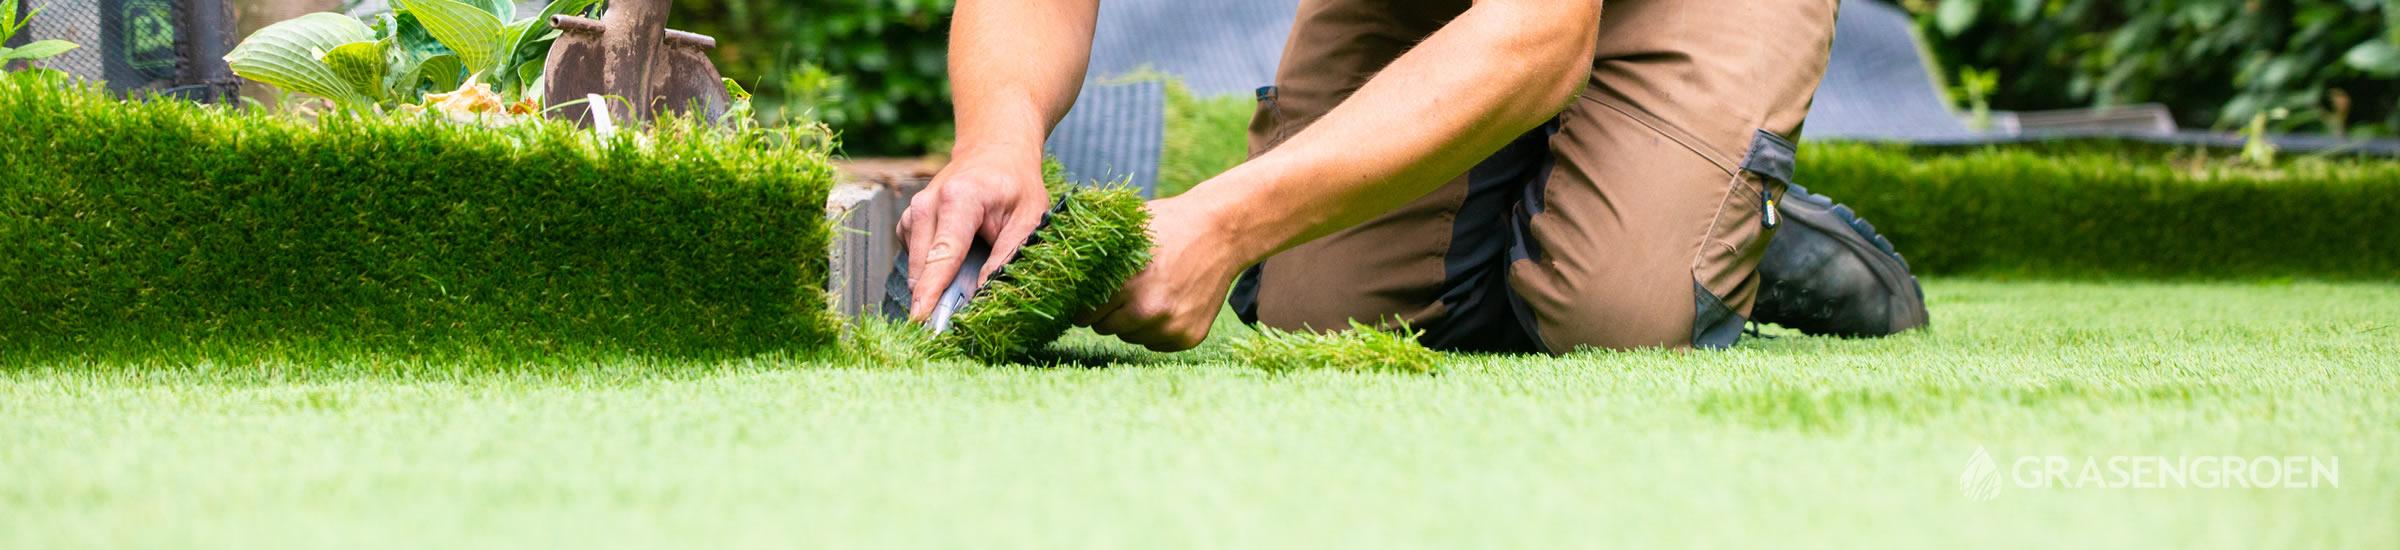 Kunstgrasleggen • Gras en Groen Kunstgras